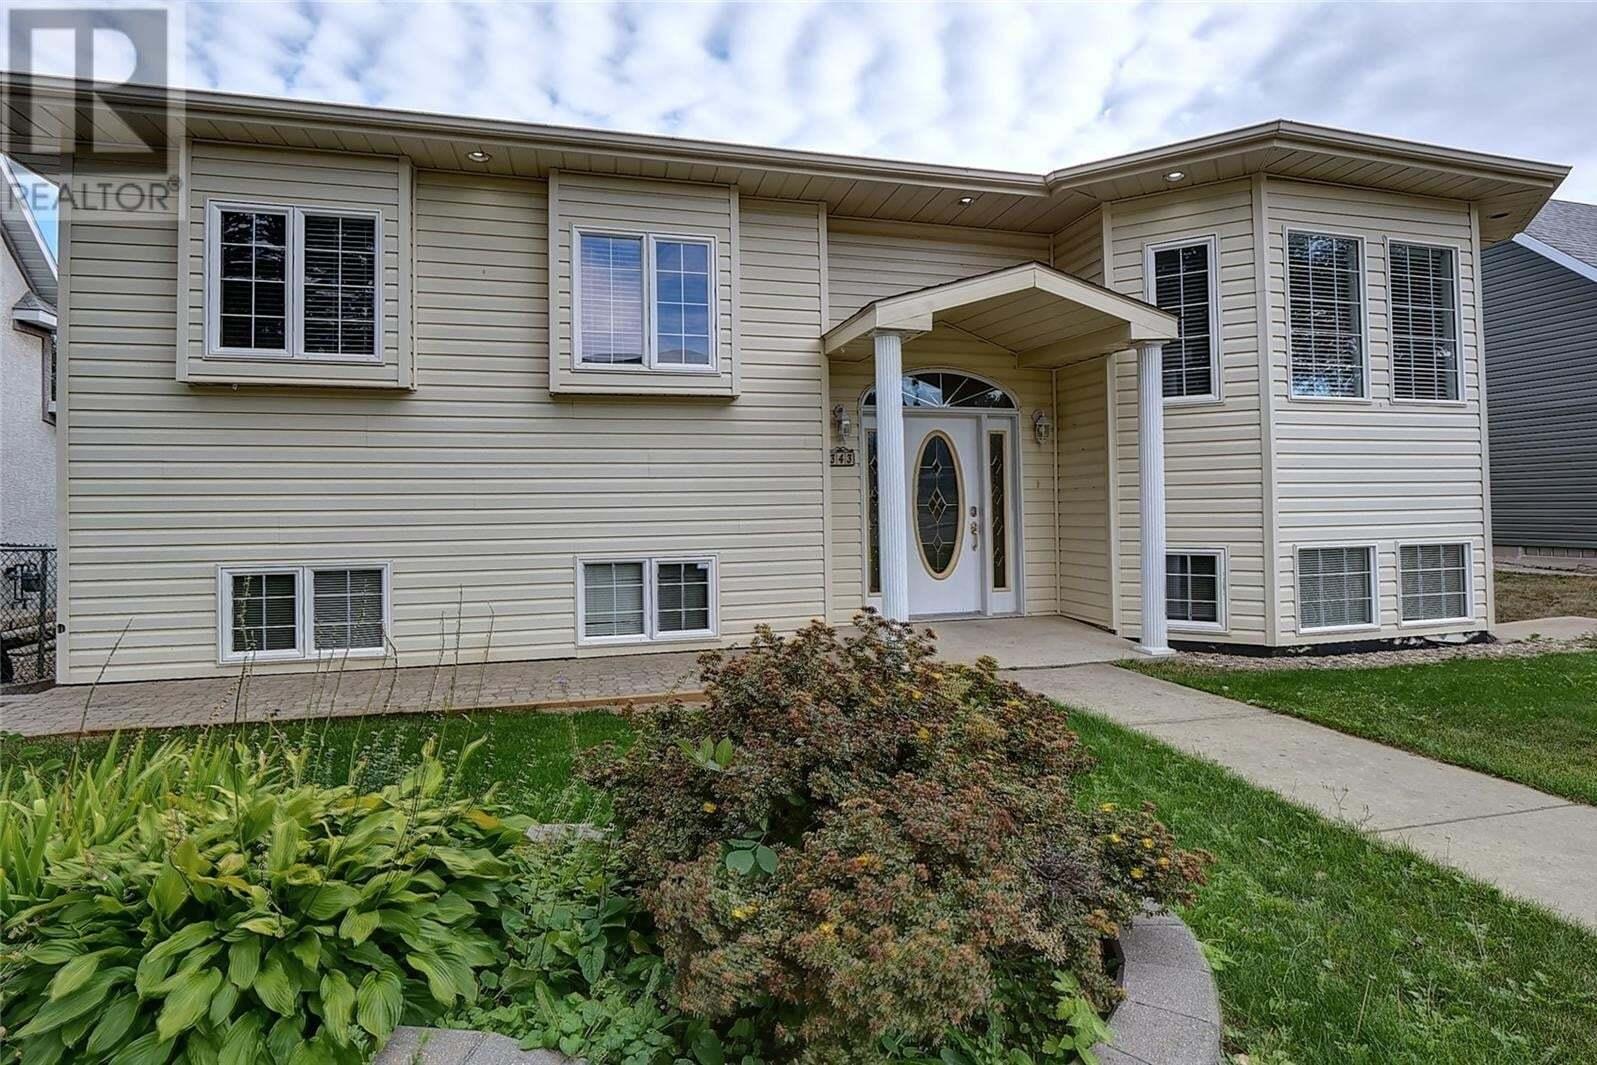 House for sale at 343 Oxford St W Moose Jaw Saskatchewan - MLS: SK826341